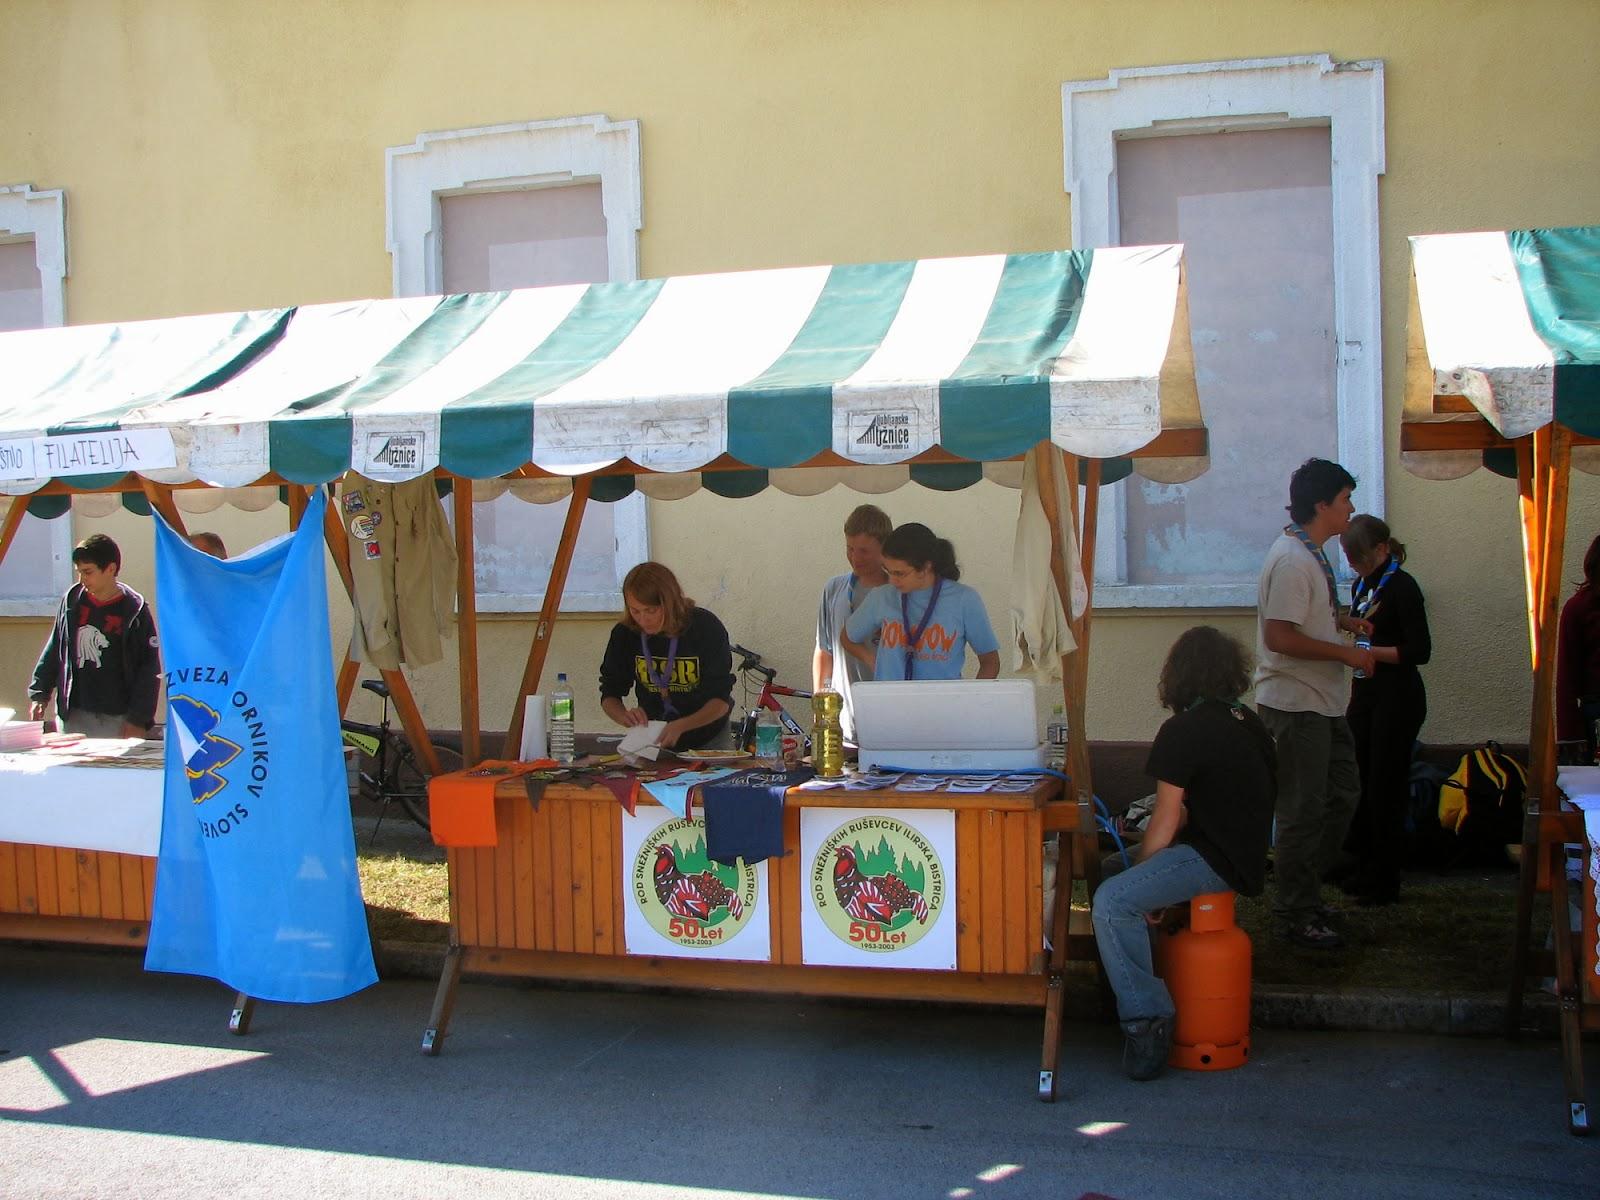 Bistrški dnevi, Ilirska Bistrica 2005 - picture%2B129.jpg